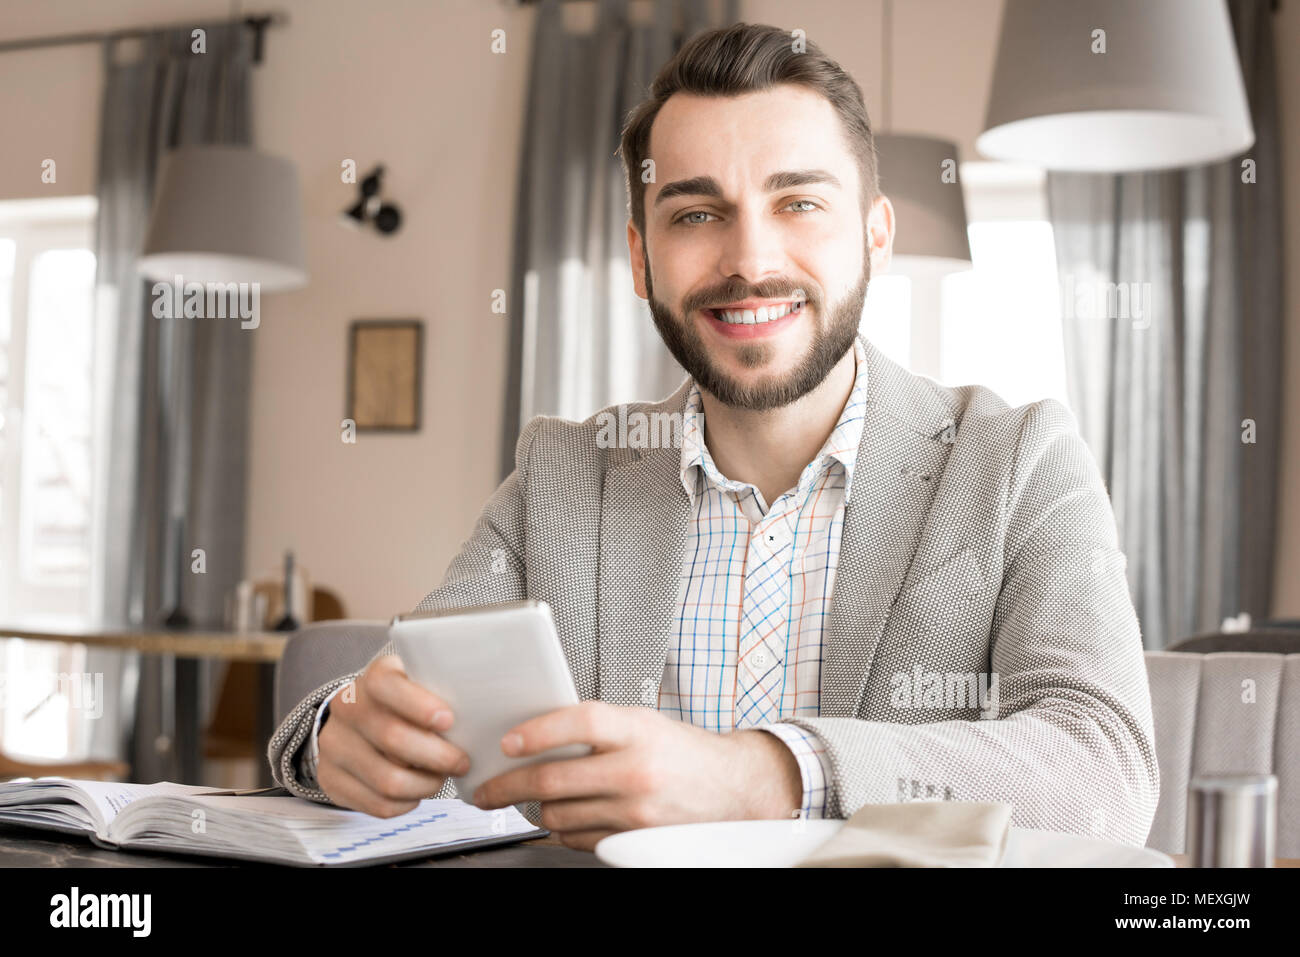 Positive confident entrepreneur in cozy restaurant - Stock Image